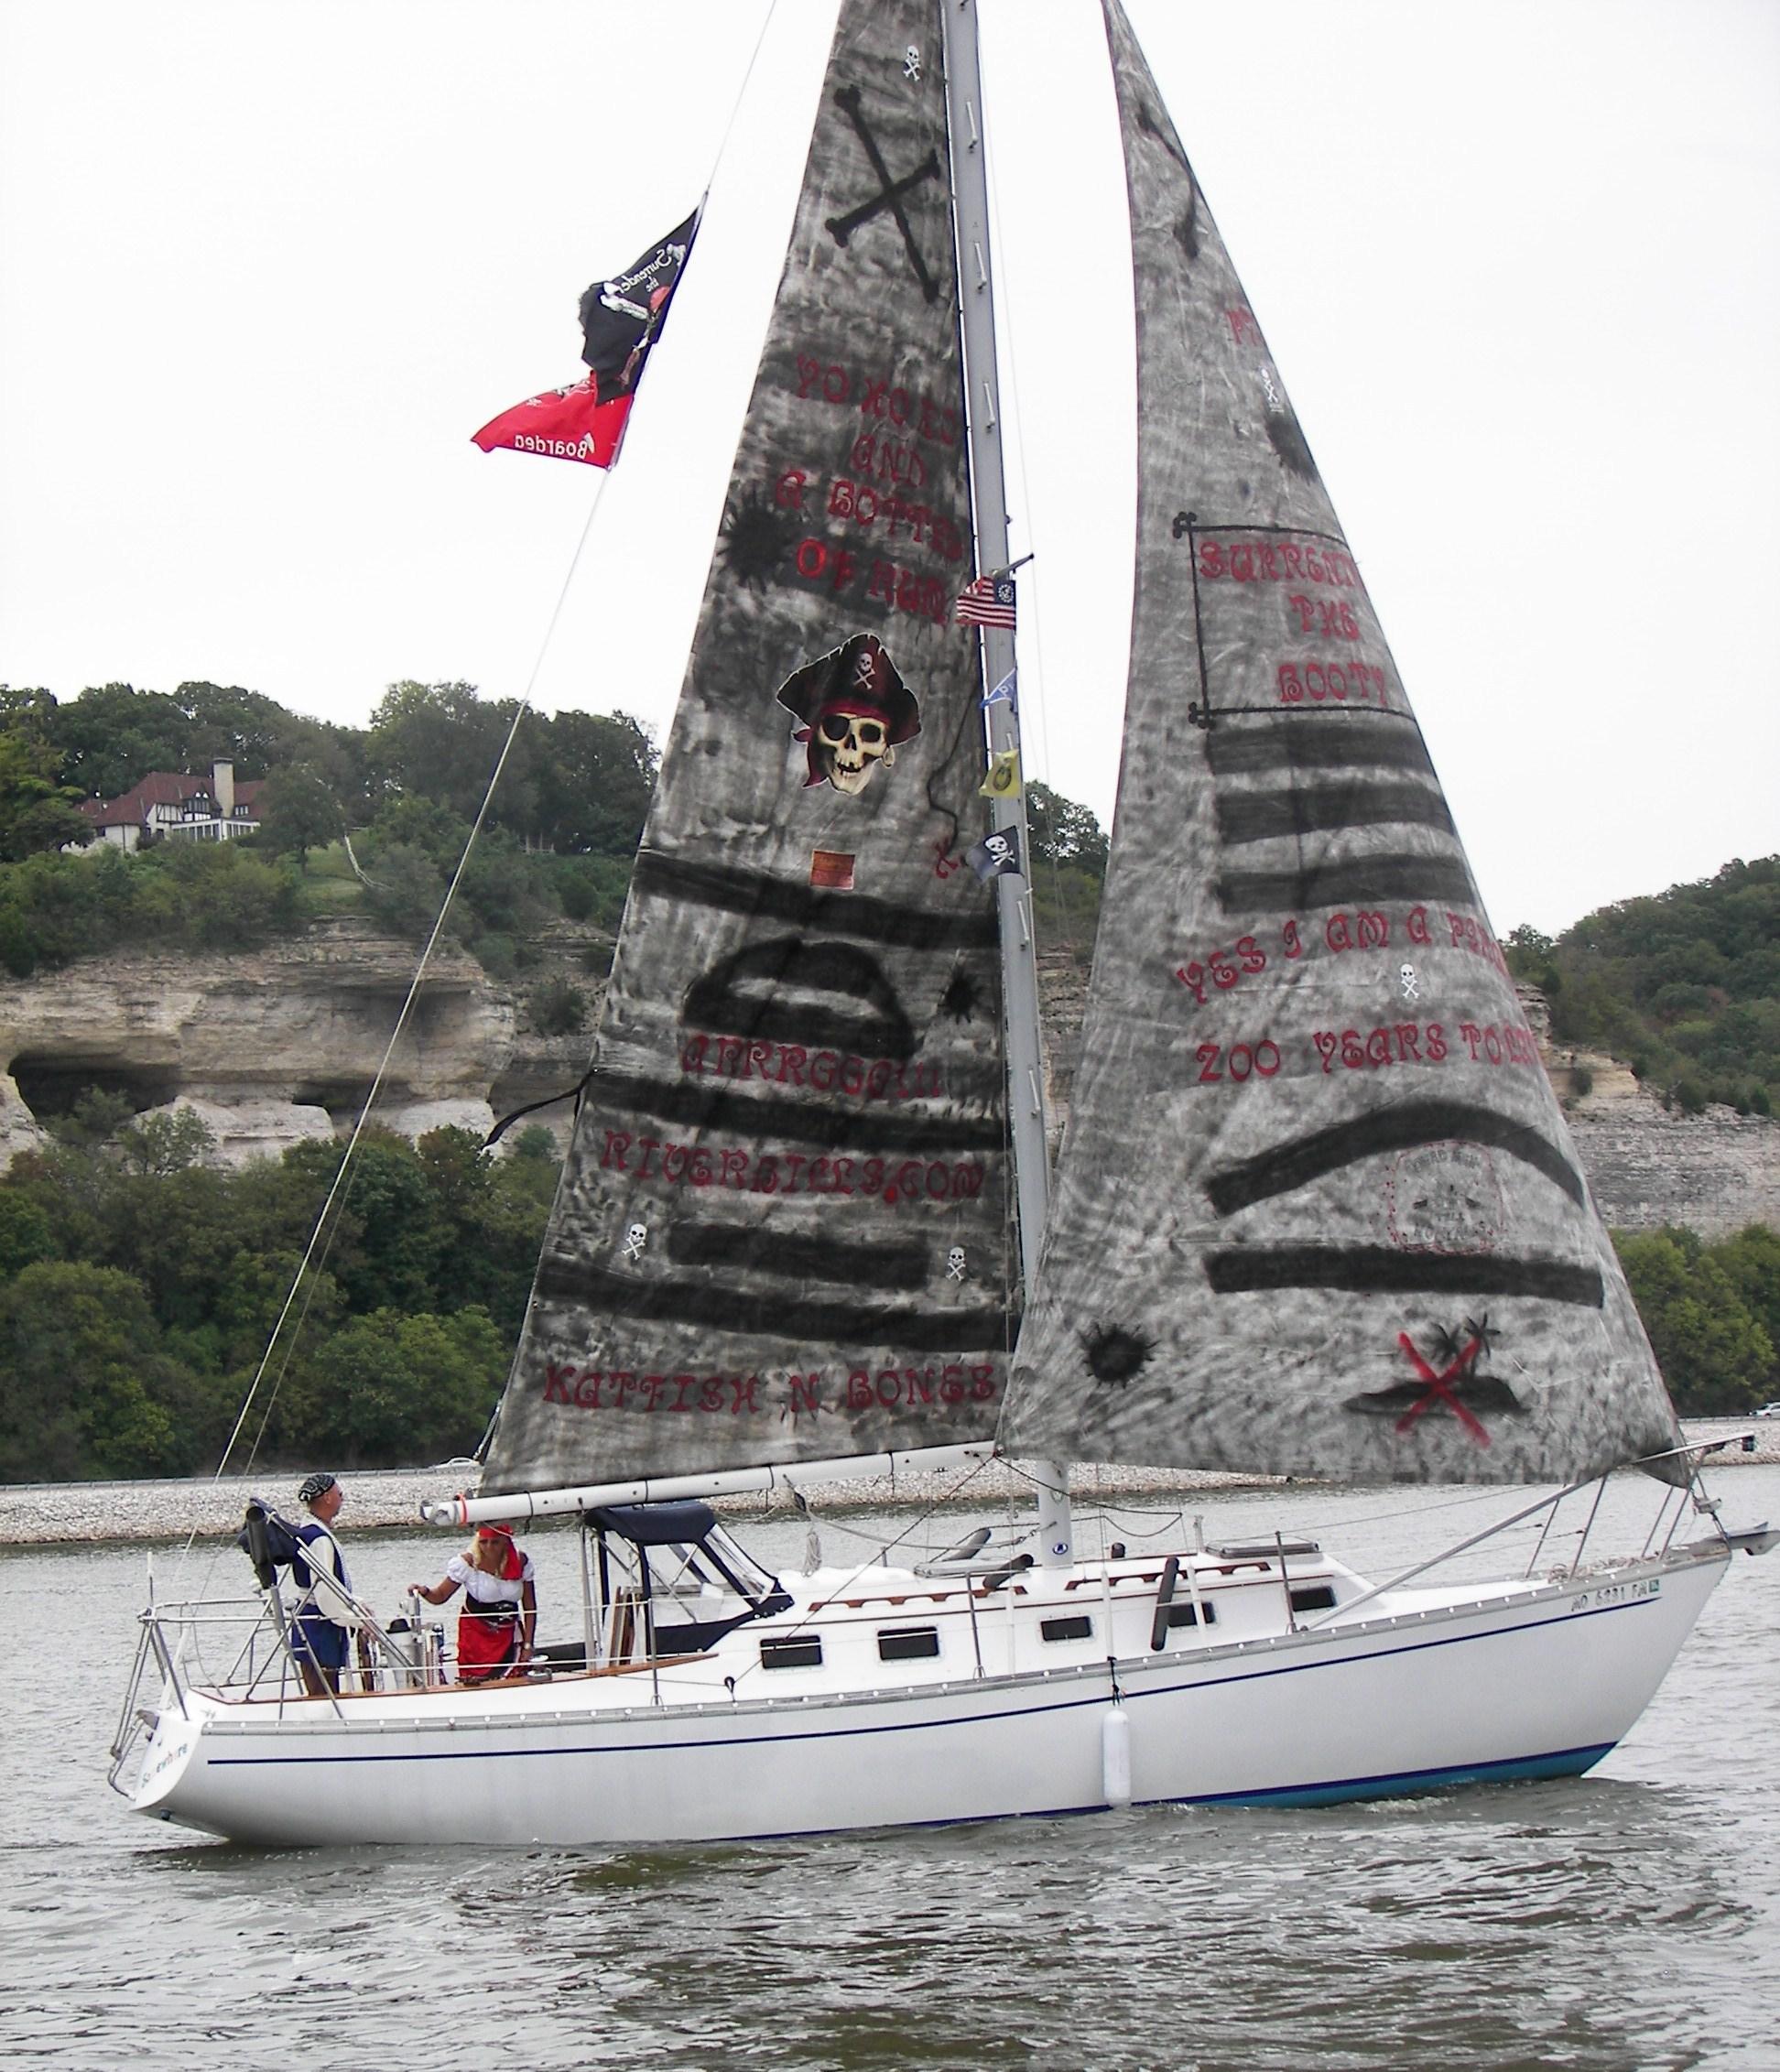 Annual Pirate Day